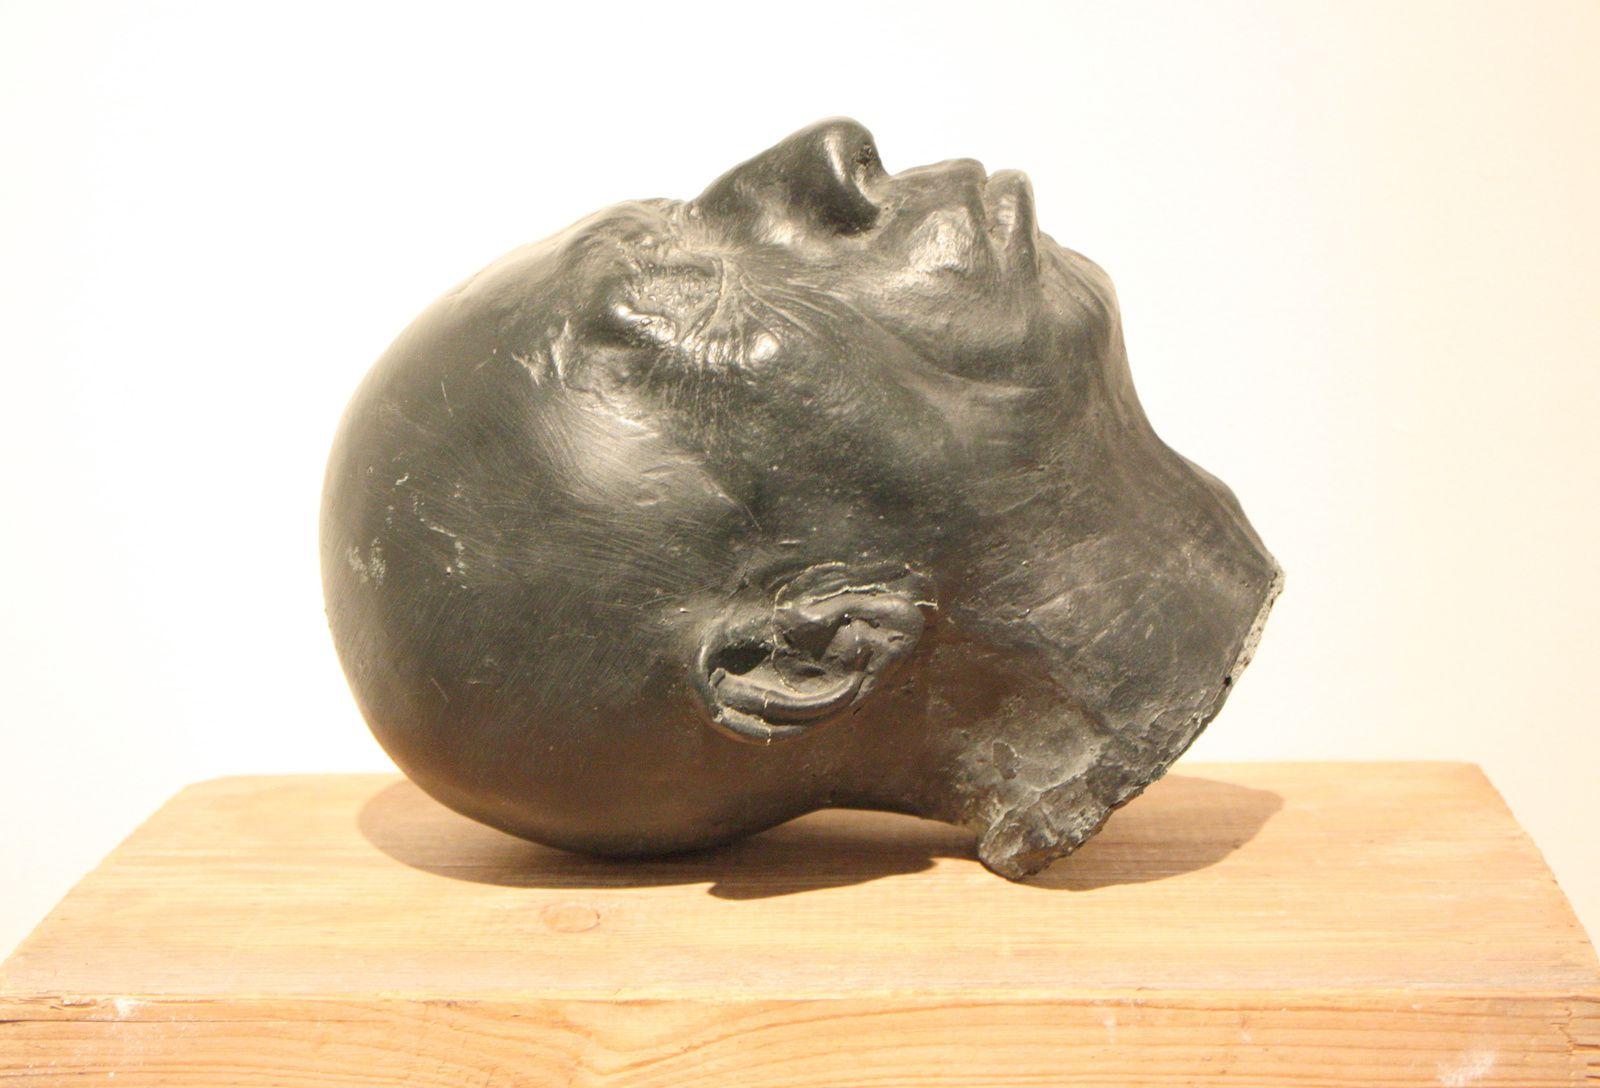 Head, 2011